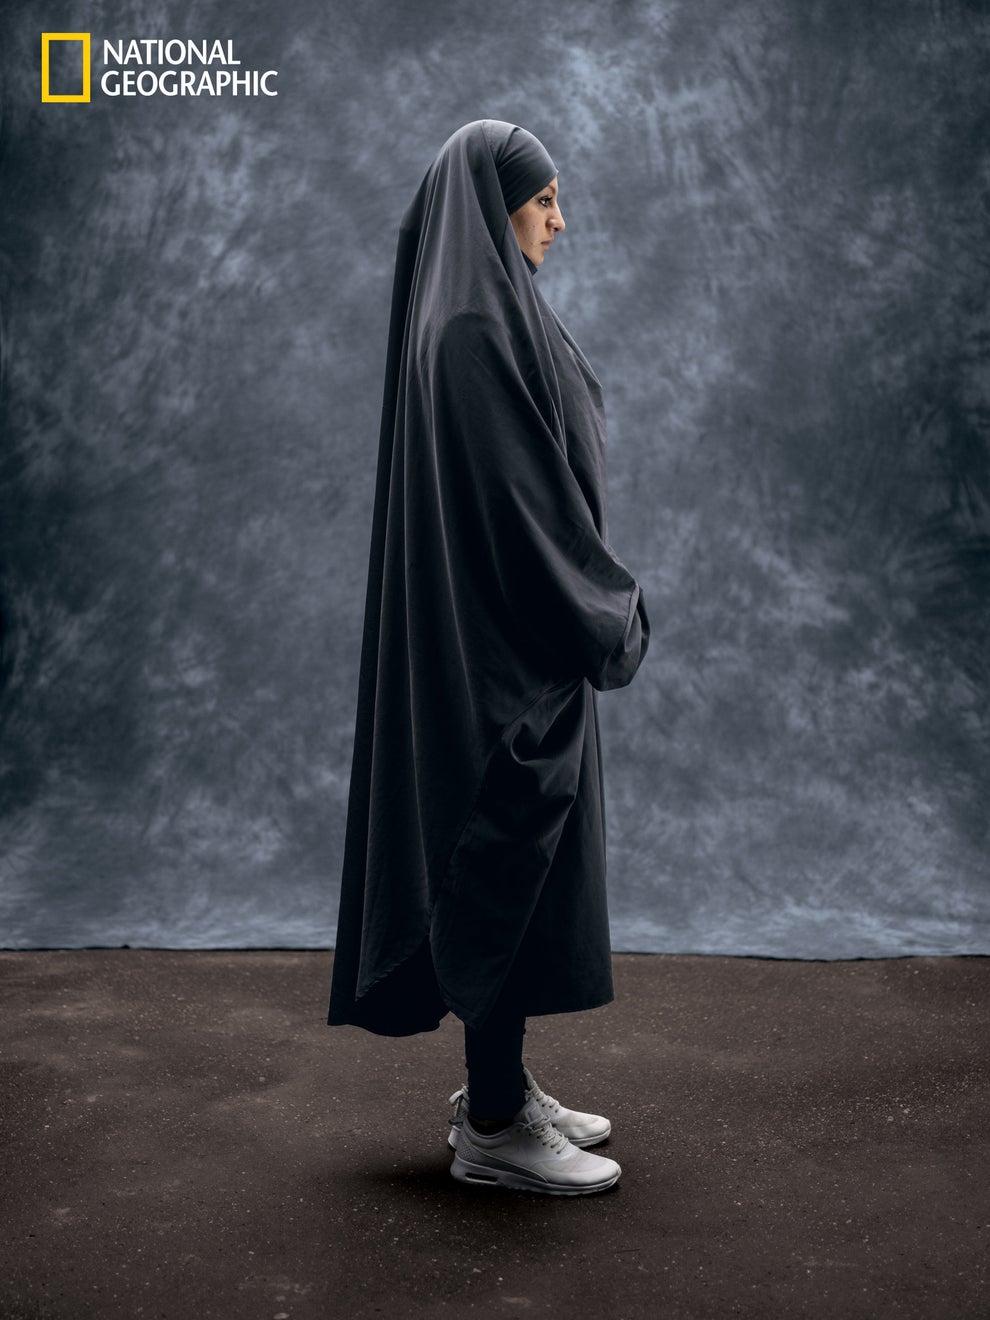 7. Ikram Chahmi Gheidene, age 23, Paris.